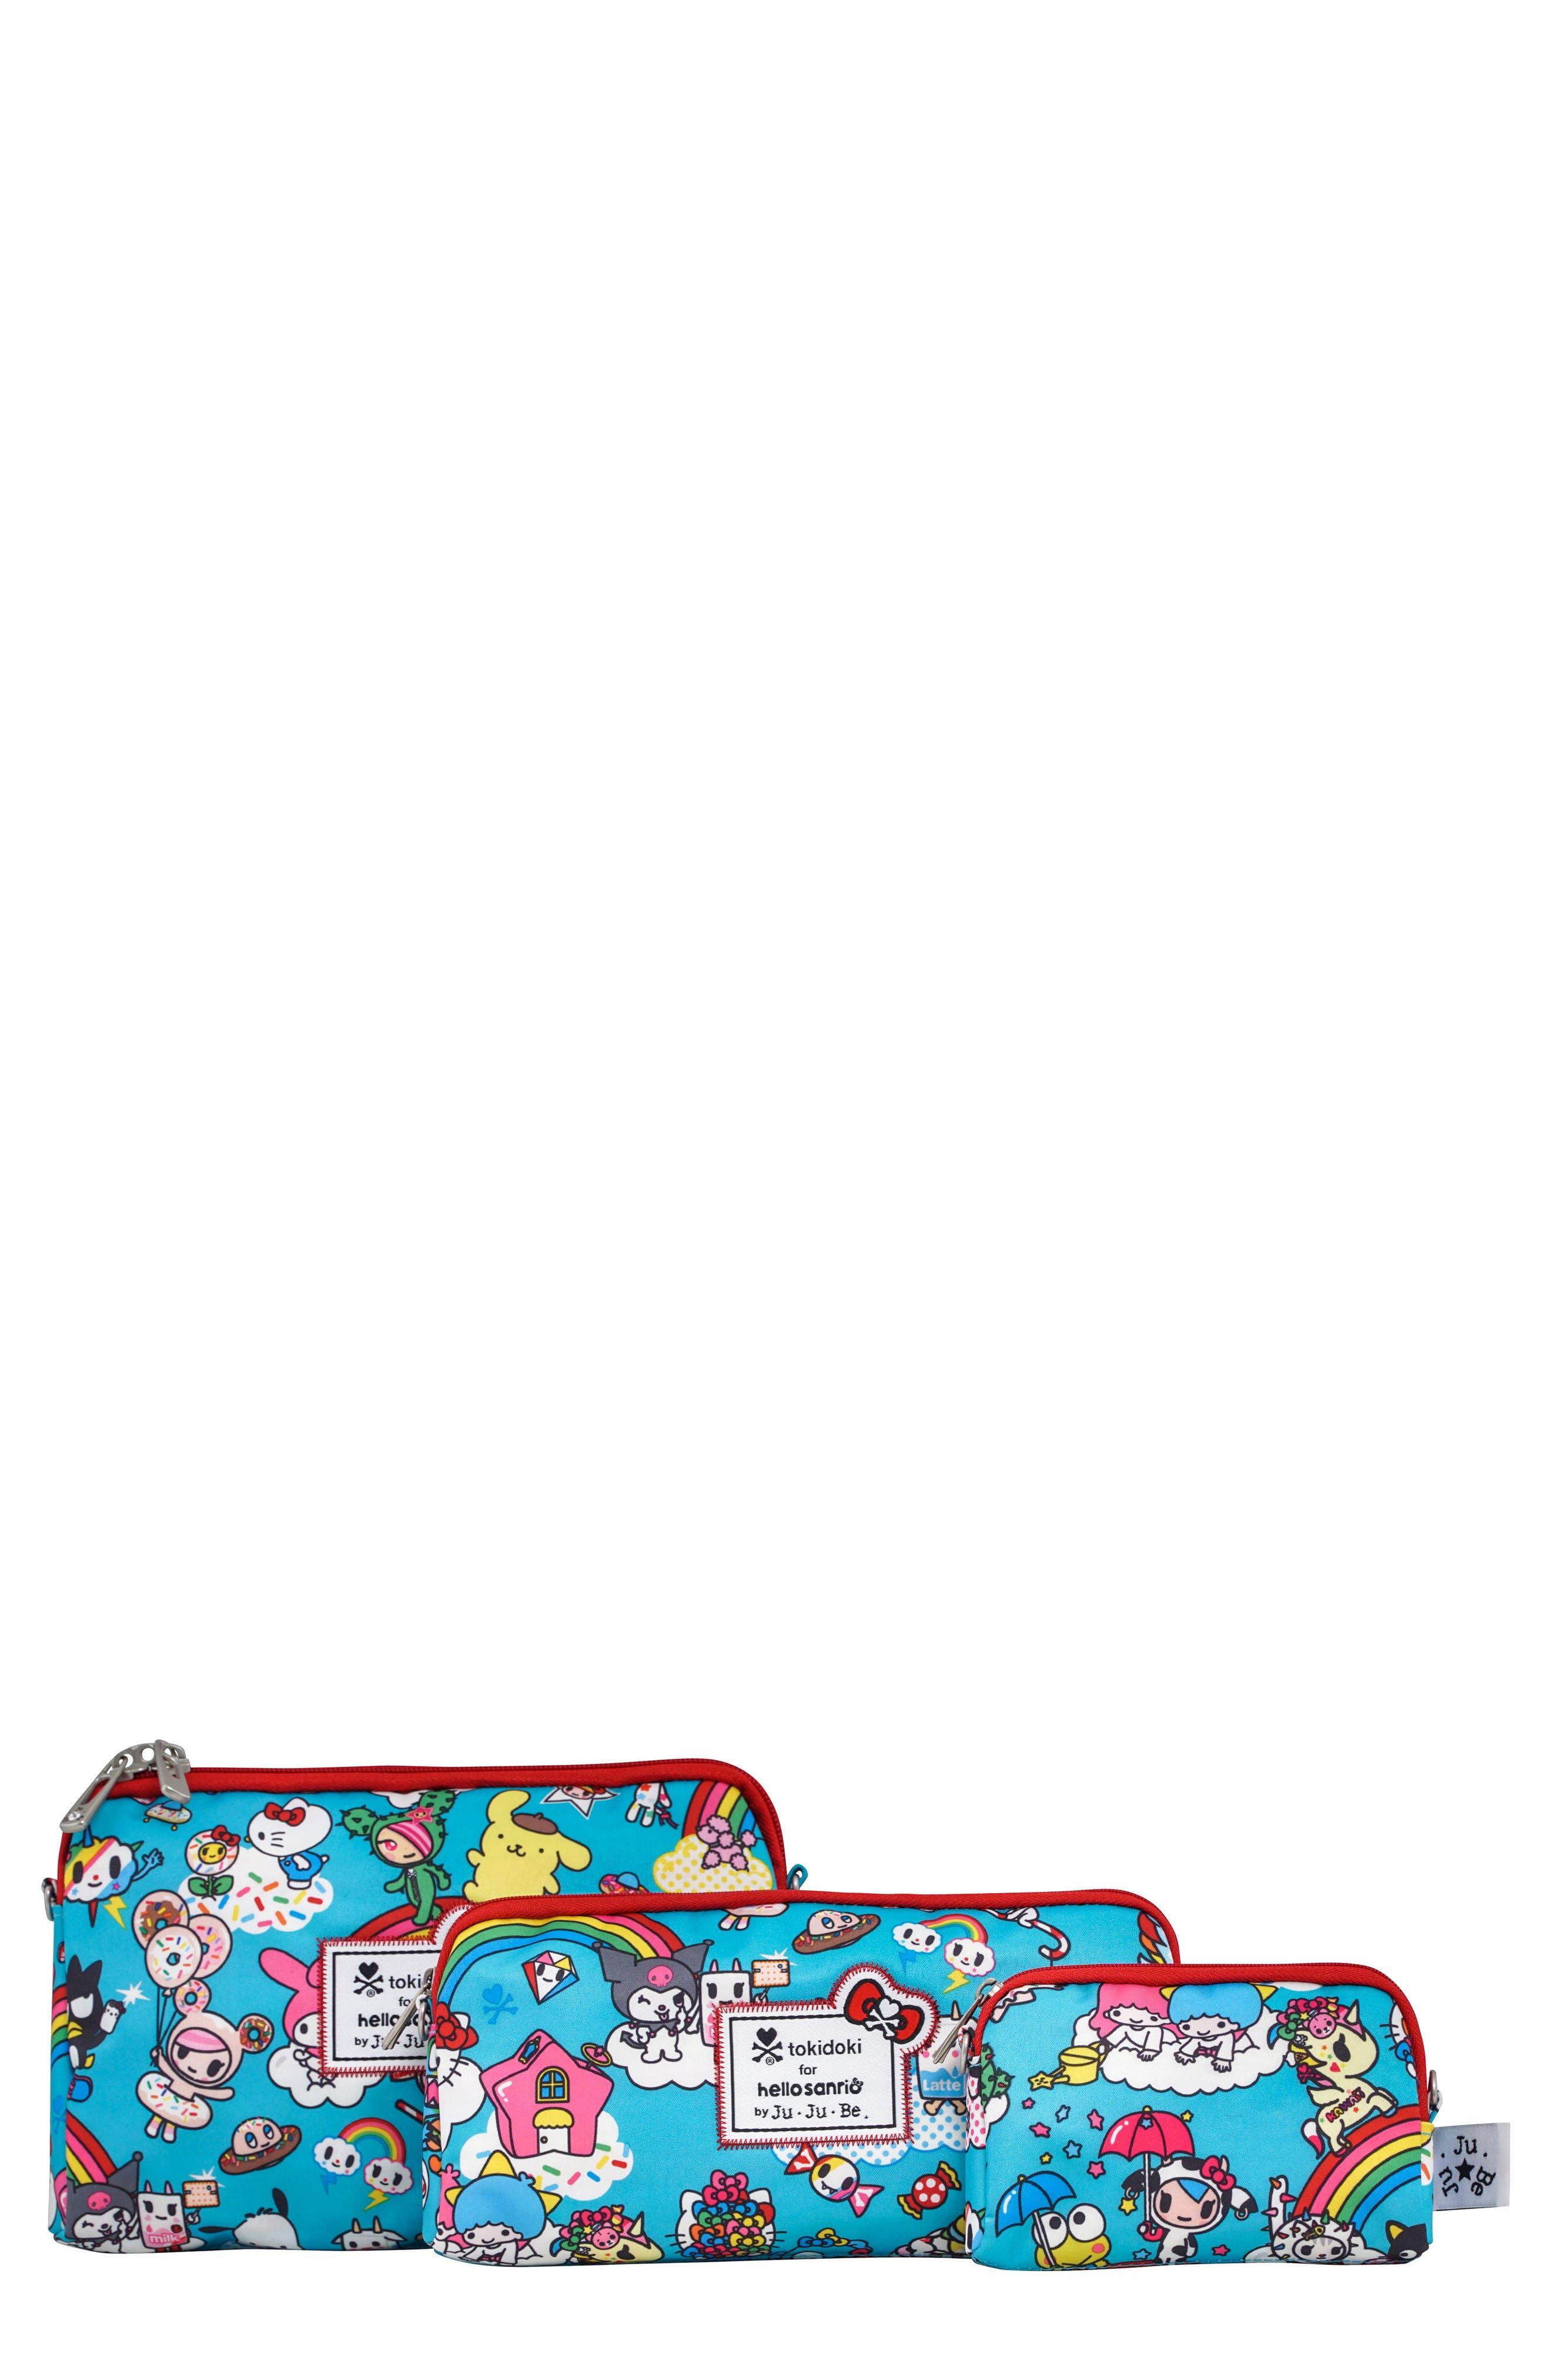 x tokidoki for Hello Sanrio Rainbow Dreams Be Organized Set of 3 Top Zip Cases,                         Main,                         color, 433